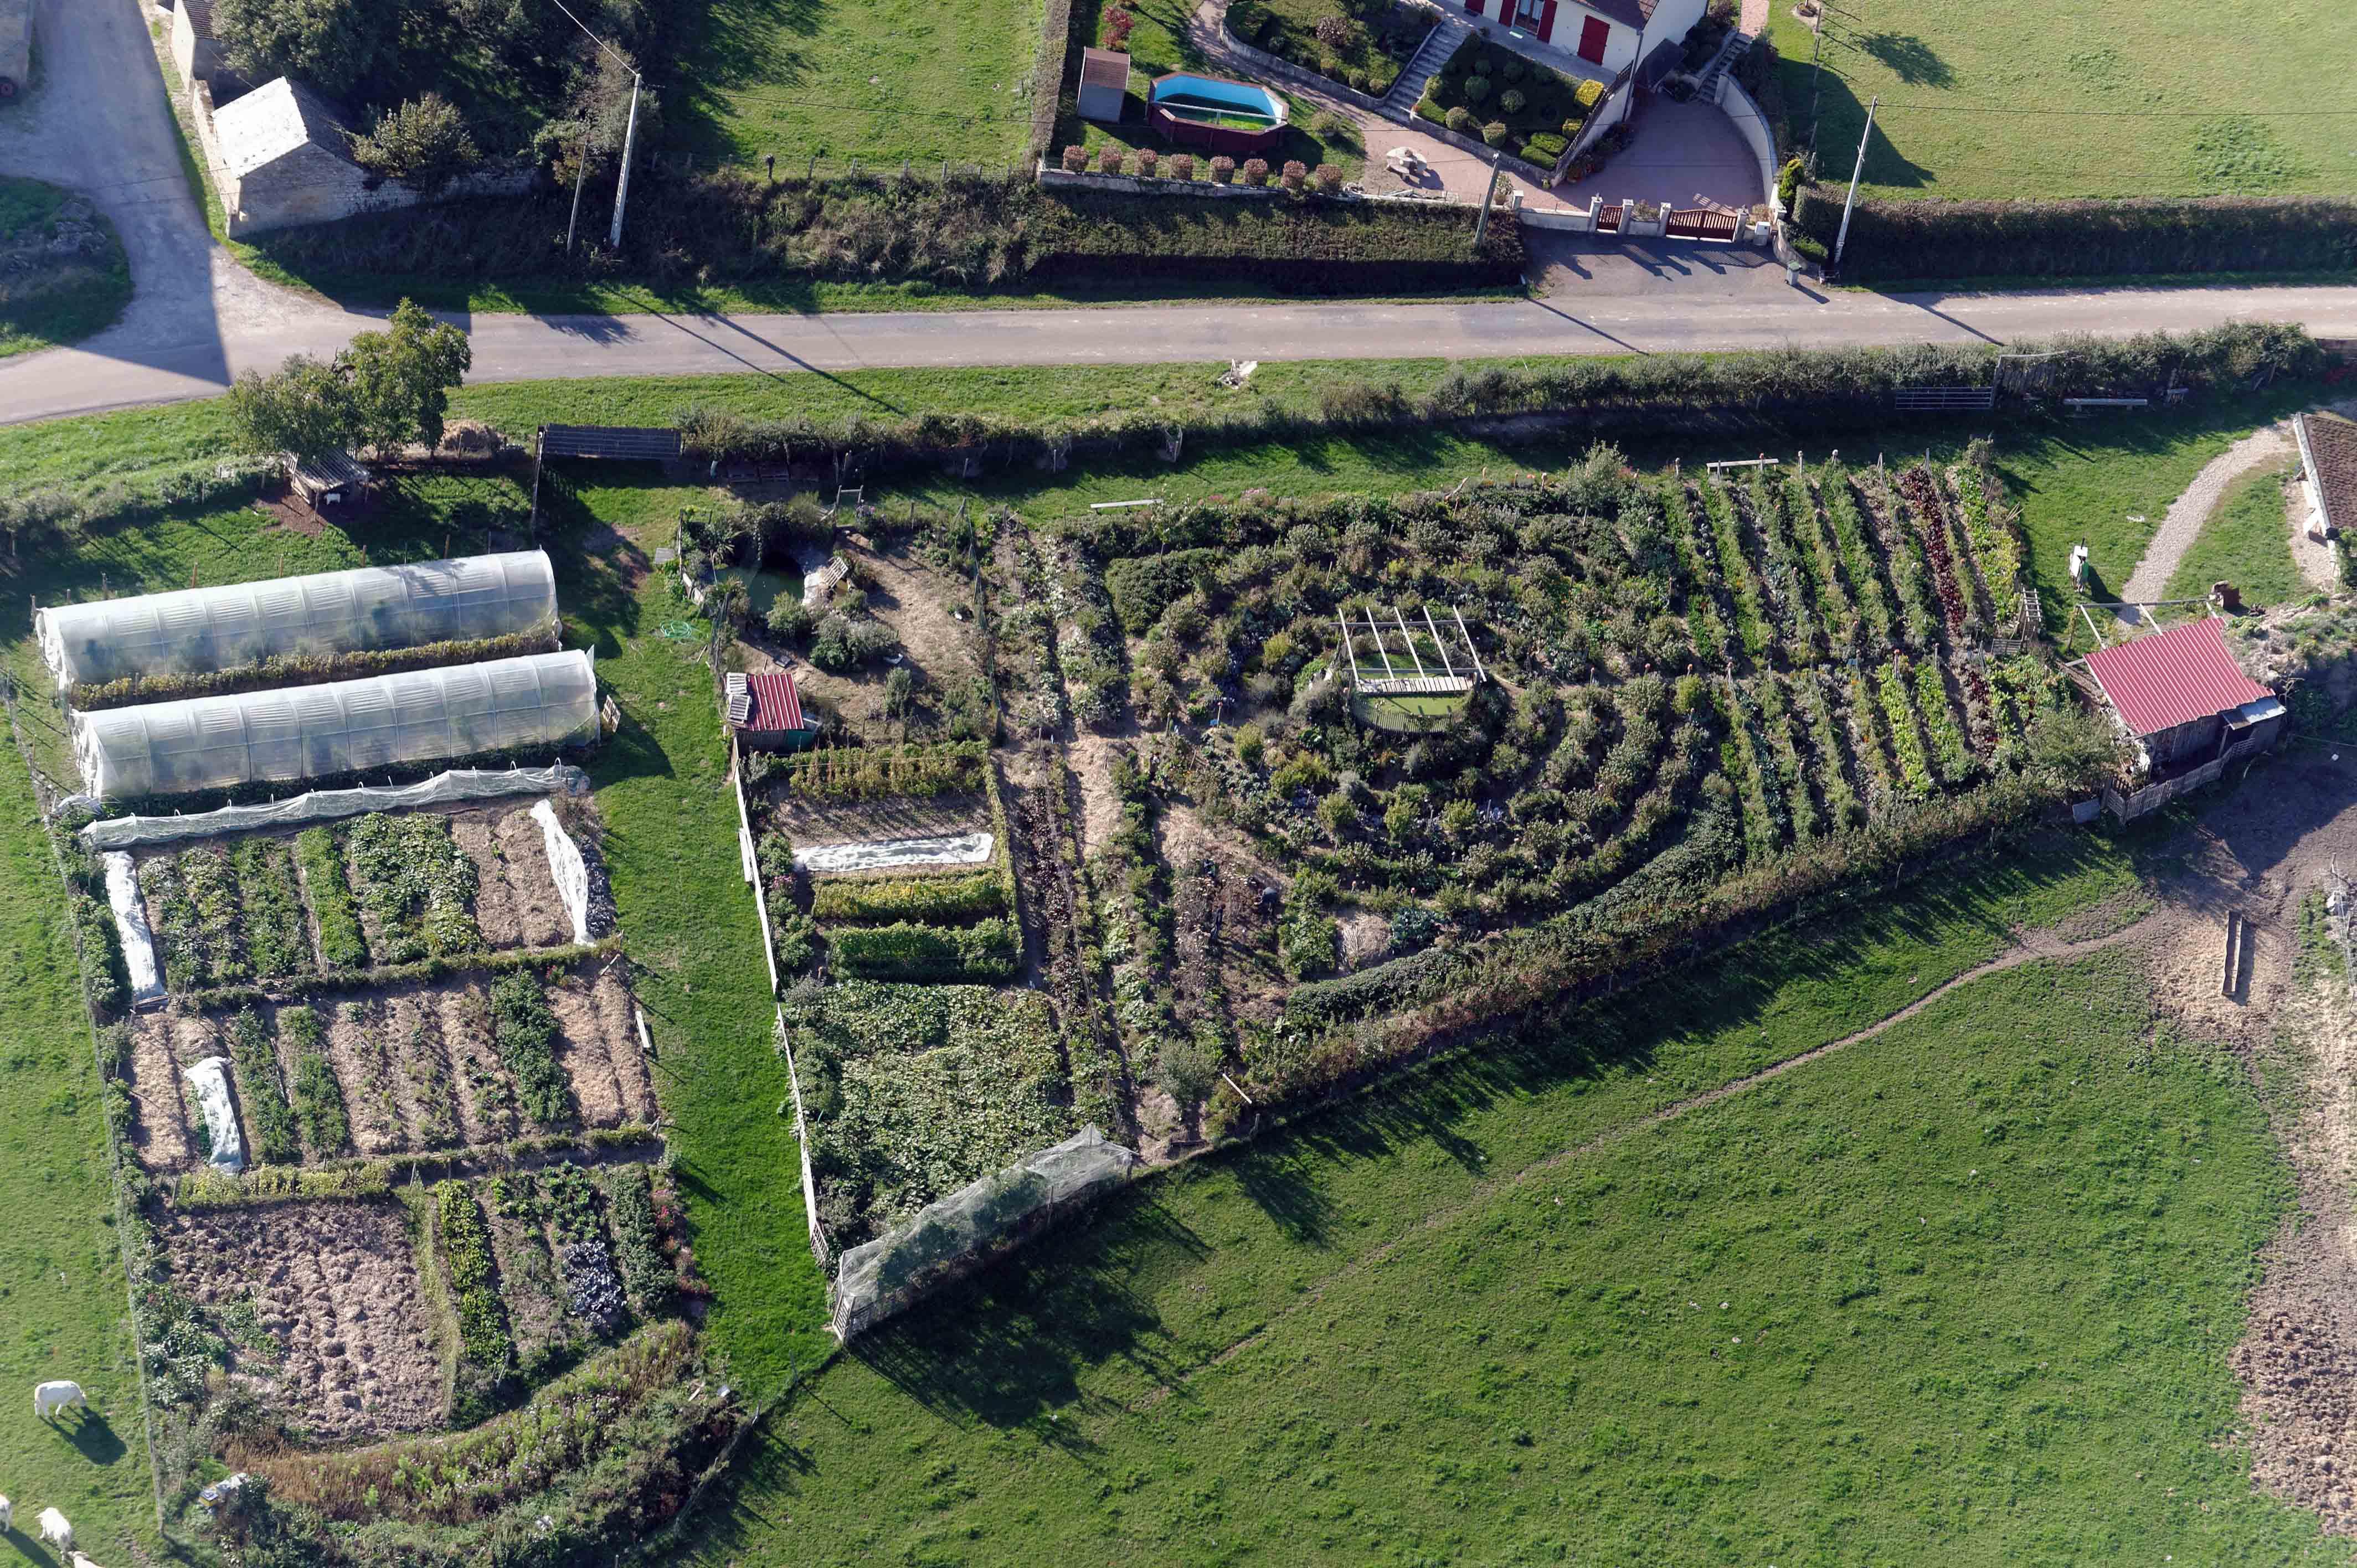 filejardin permaculture pdagogique jpg - Jardin Permaculture